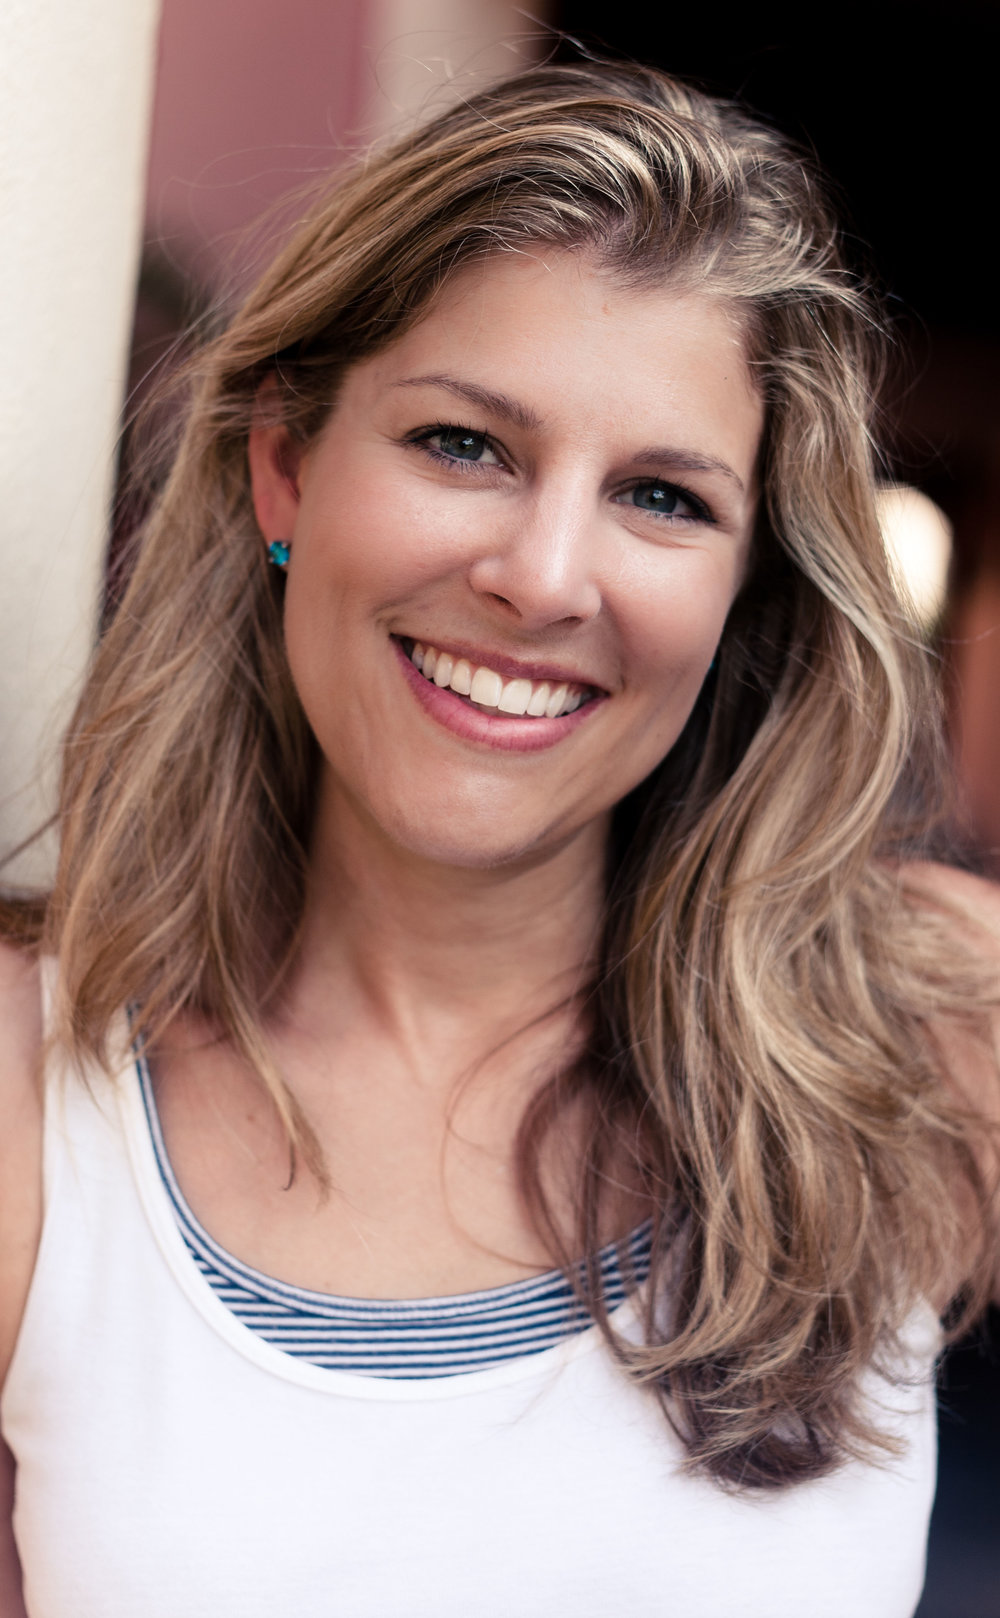 Jennifer Haakenson